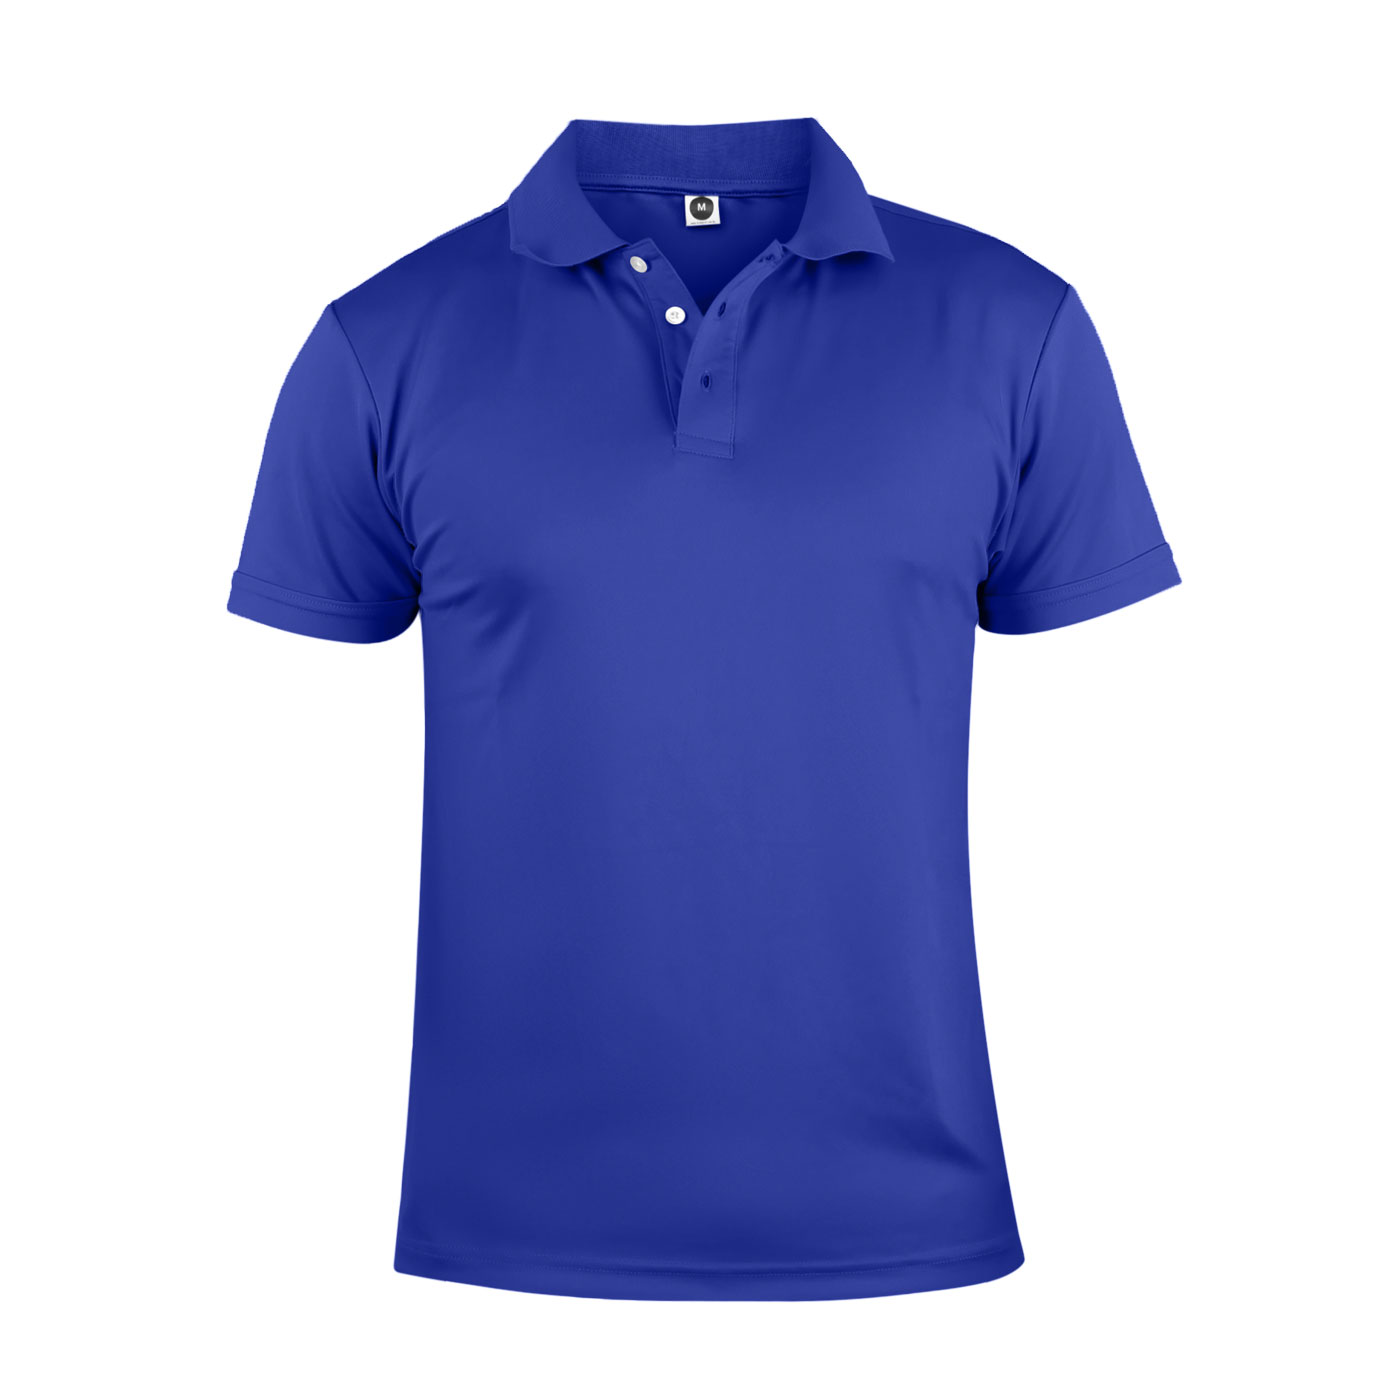 HODARLA 彈力涼感短袖POLO衫 3113901 - 藍